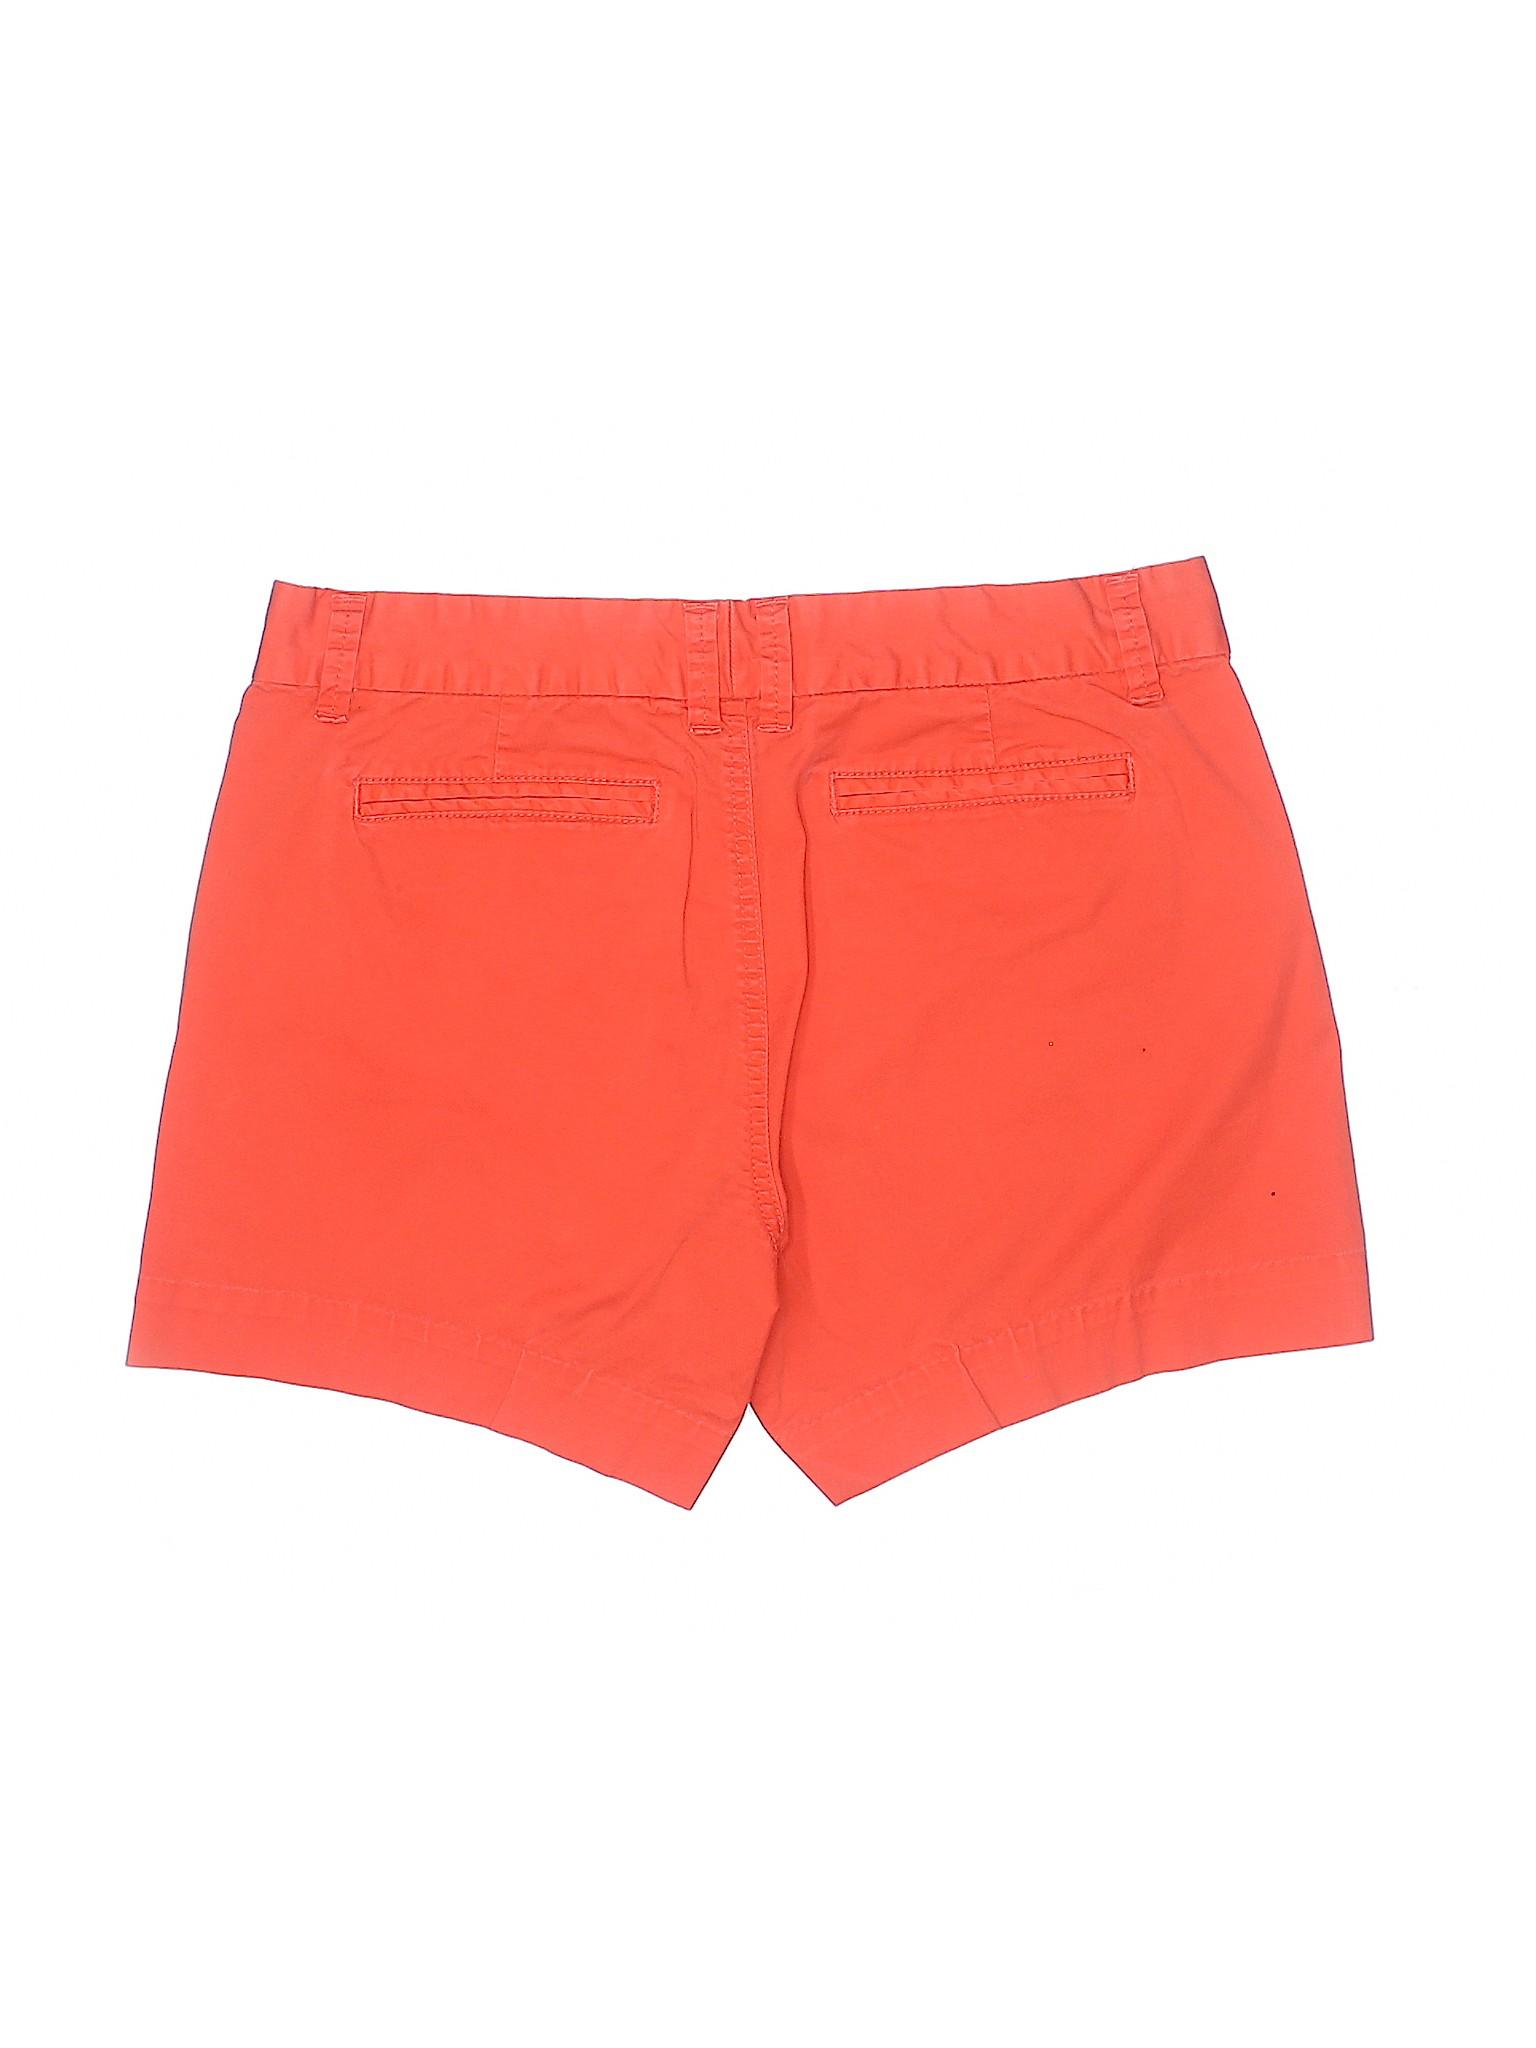 CALVIN KLEIN JEANS Khaki Shorts Boutique Sa6xqwx